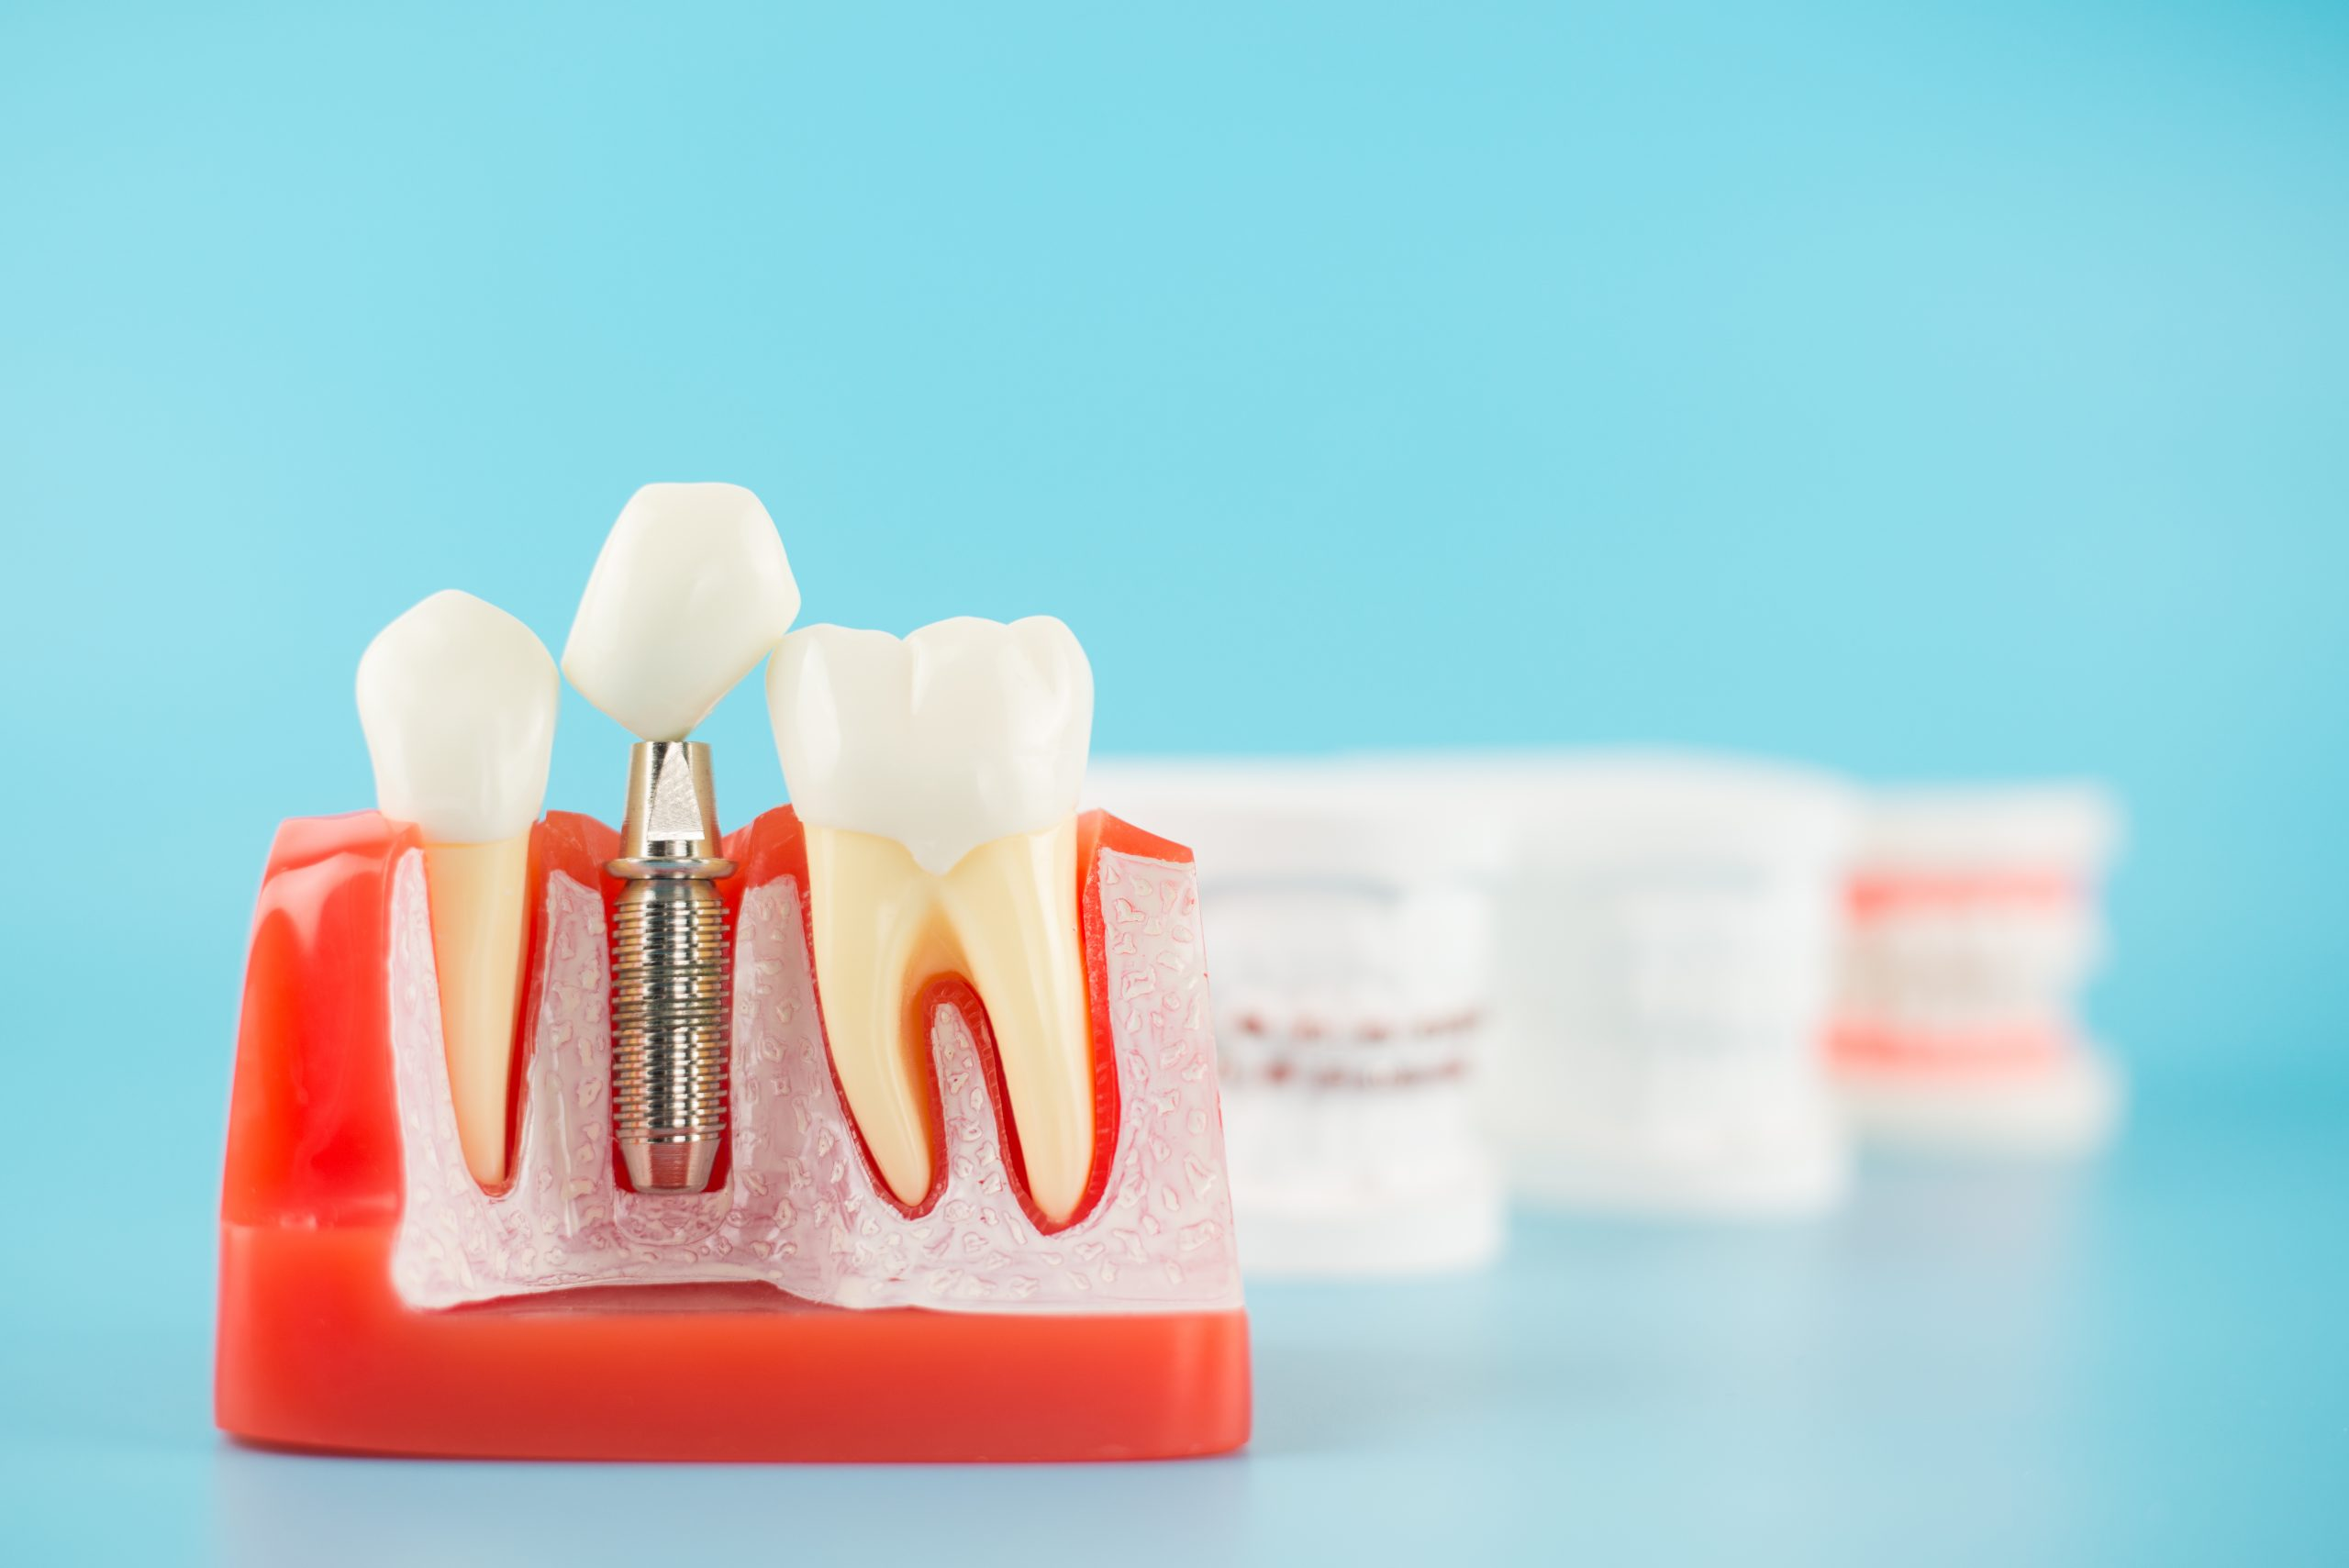 implants i cirurgia bucal, imatge d'un implant dental